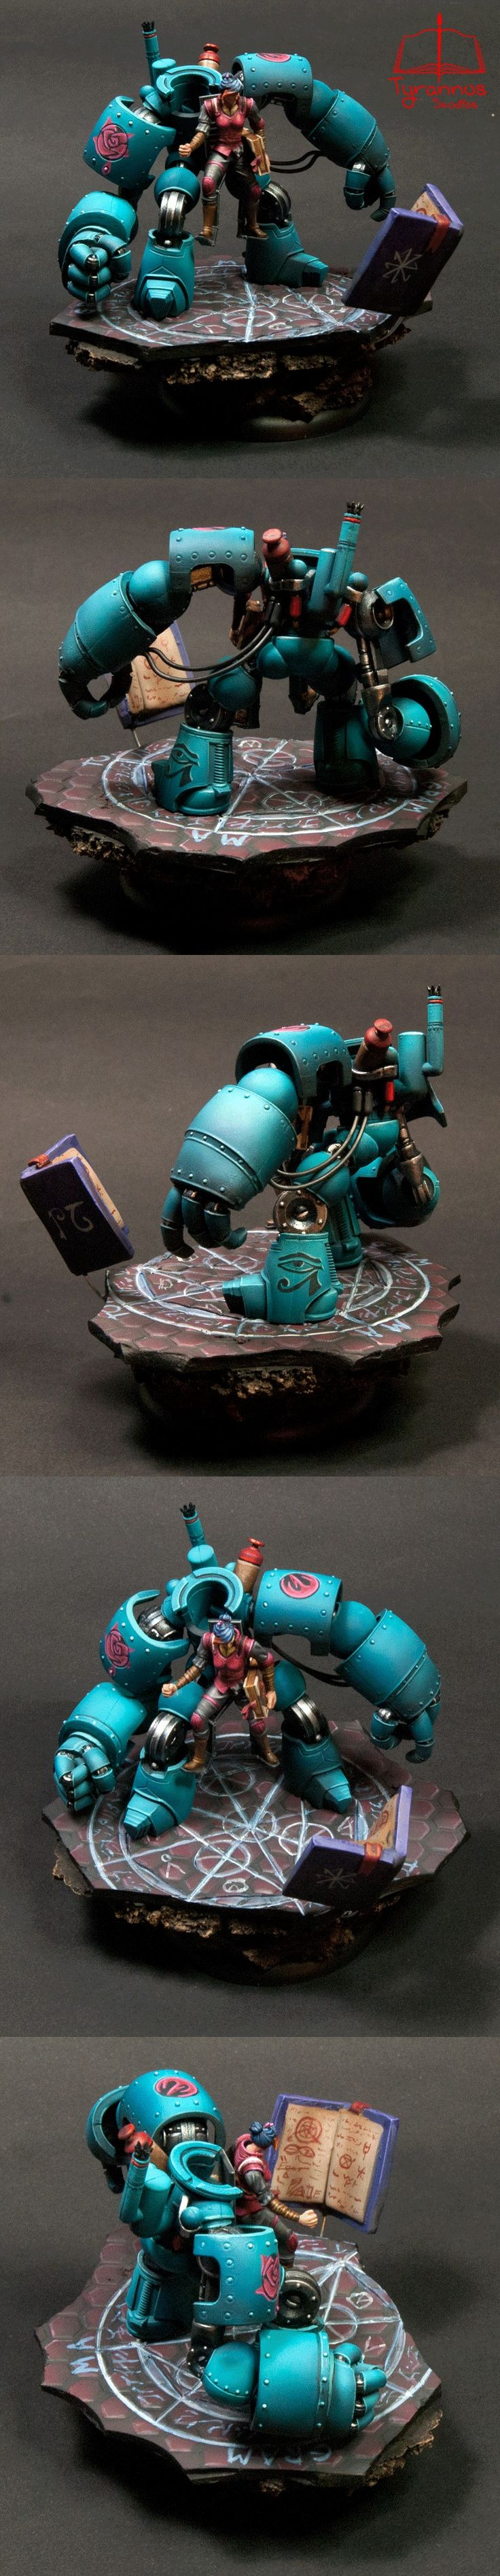 19f1be1940e7d54c88ca78962b66856f warhammer fantasy warhammer k